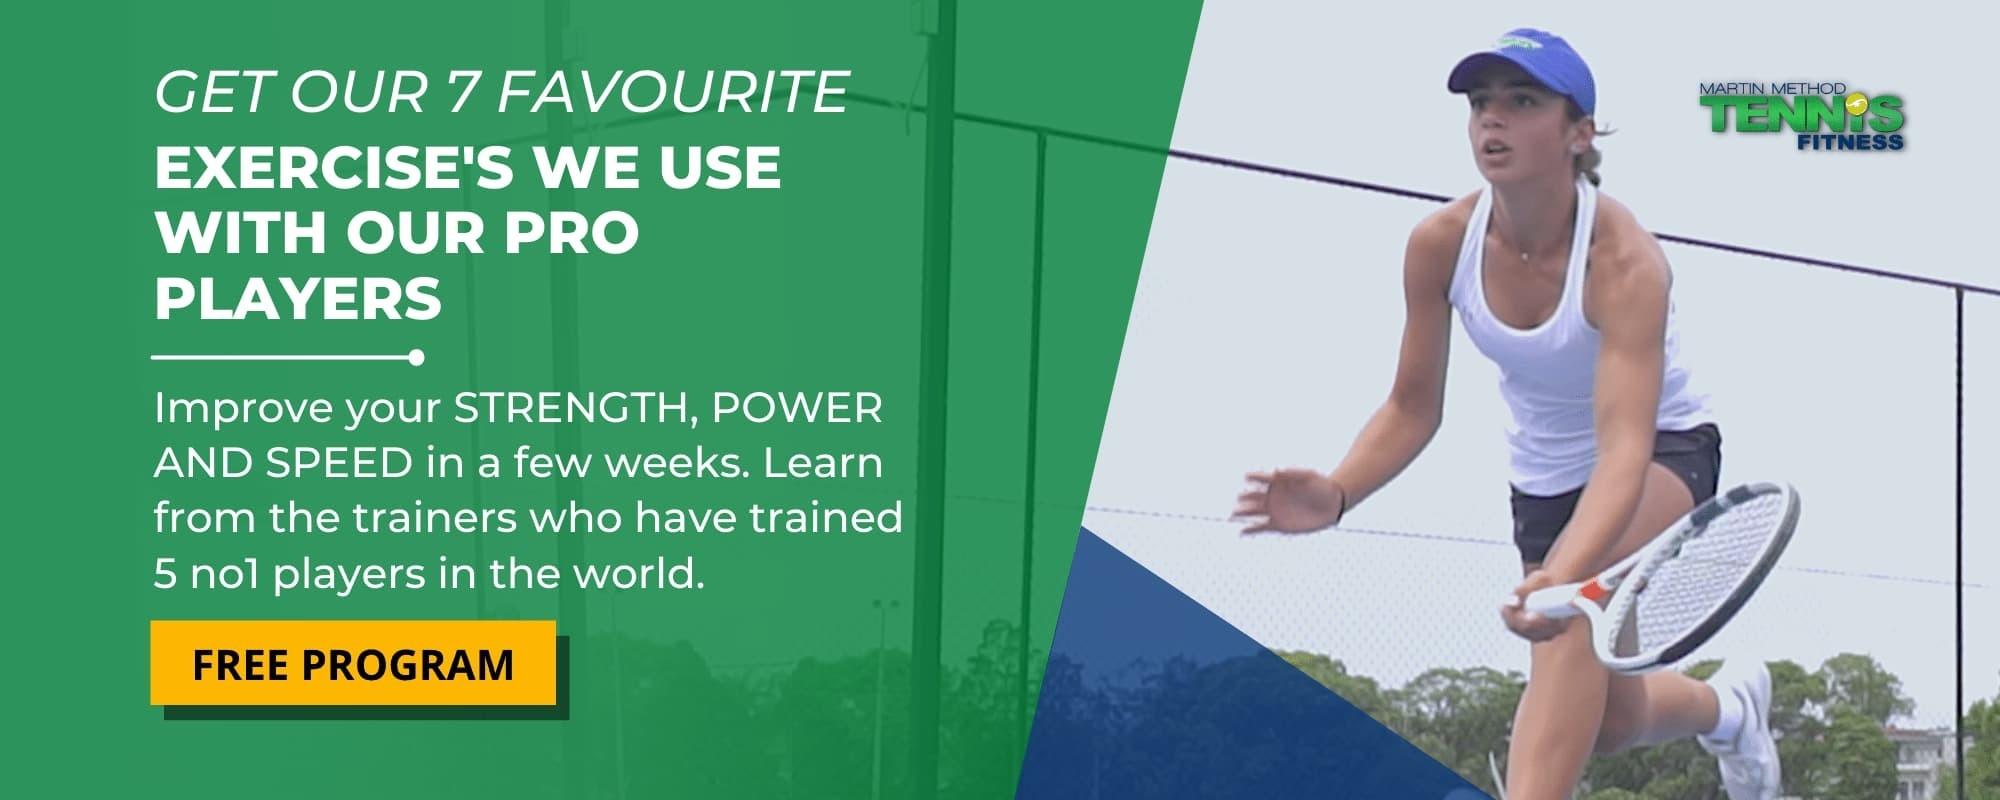 best tennis exercises